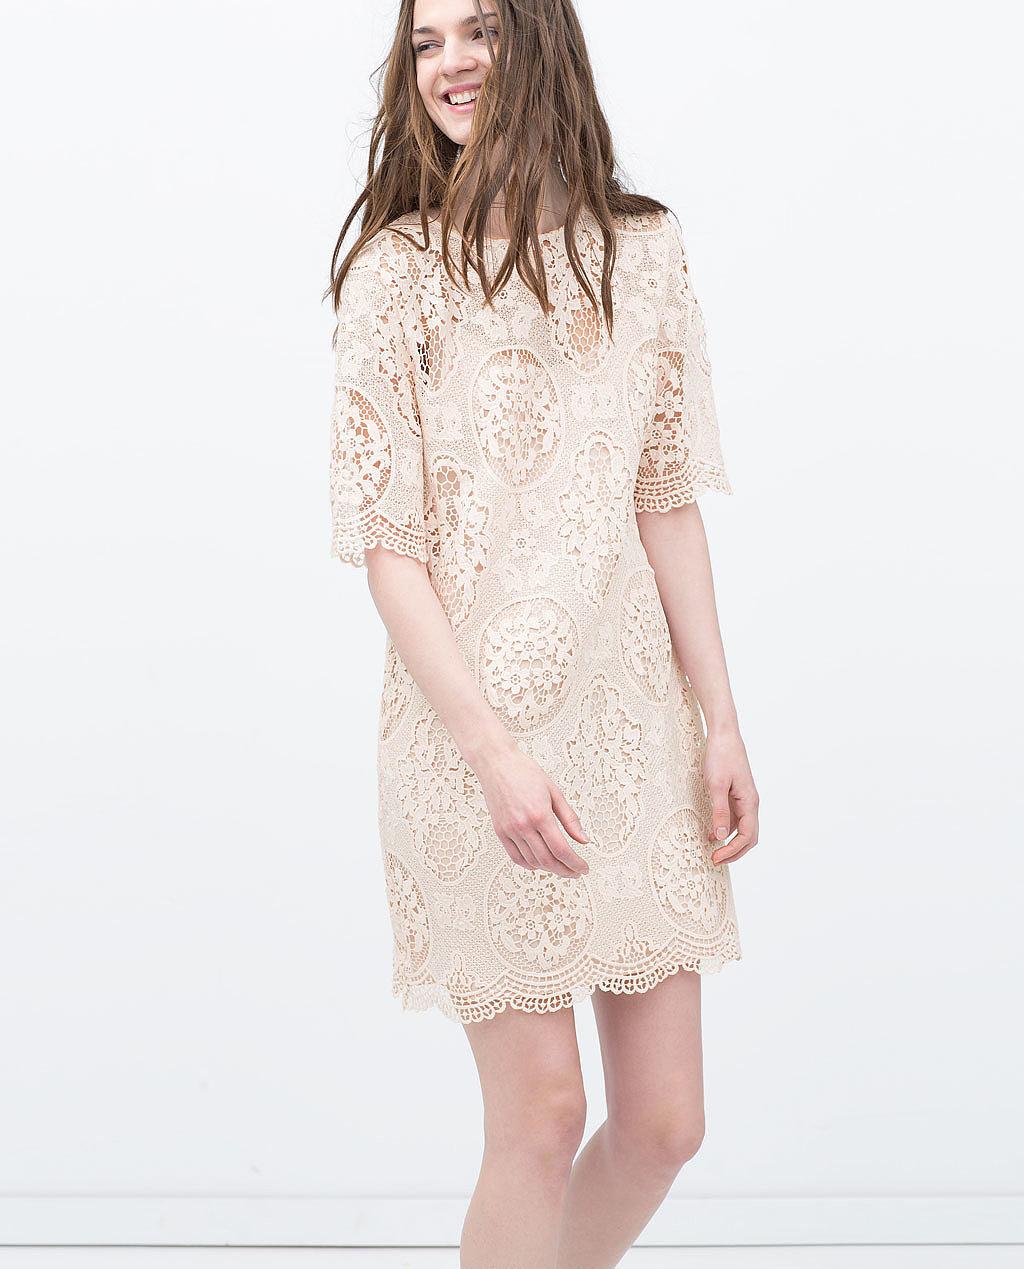 Zara Bridal Short Wedding Dresses 53